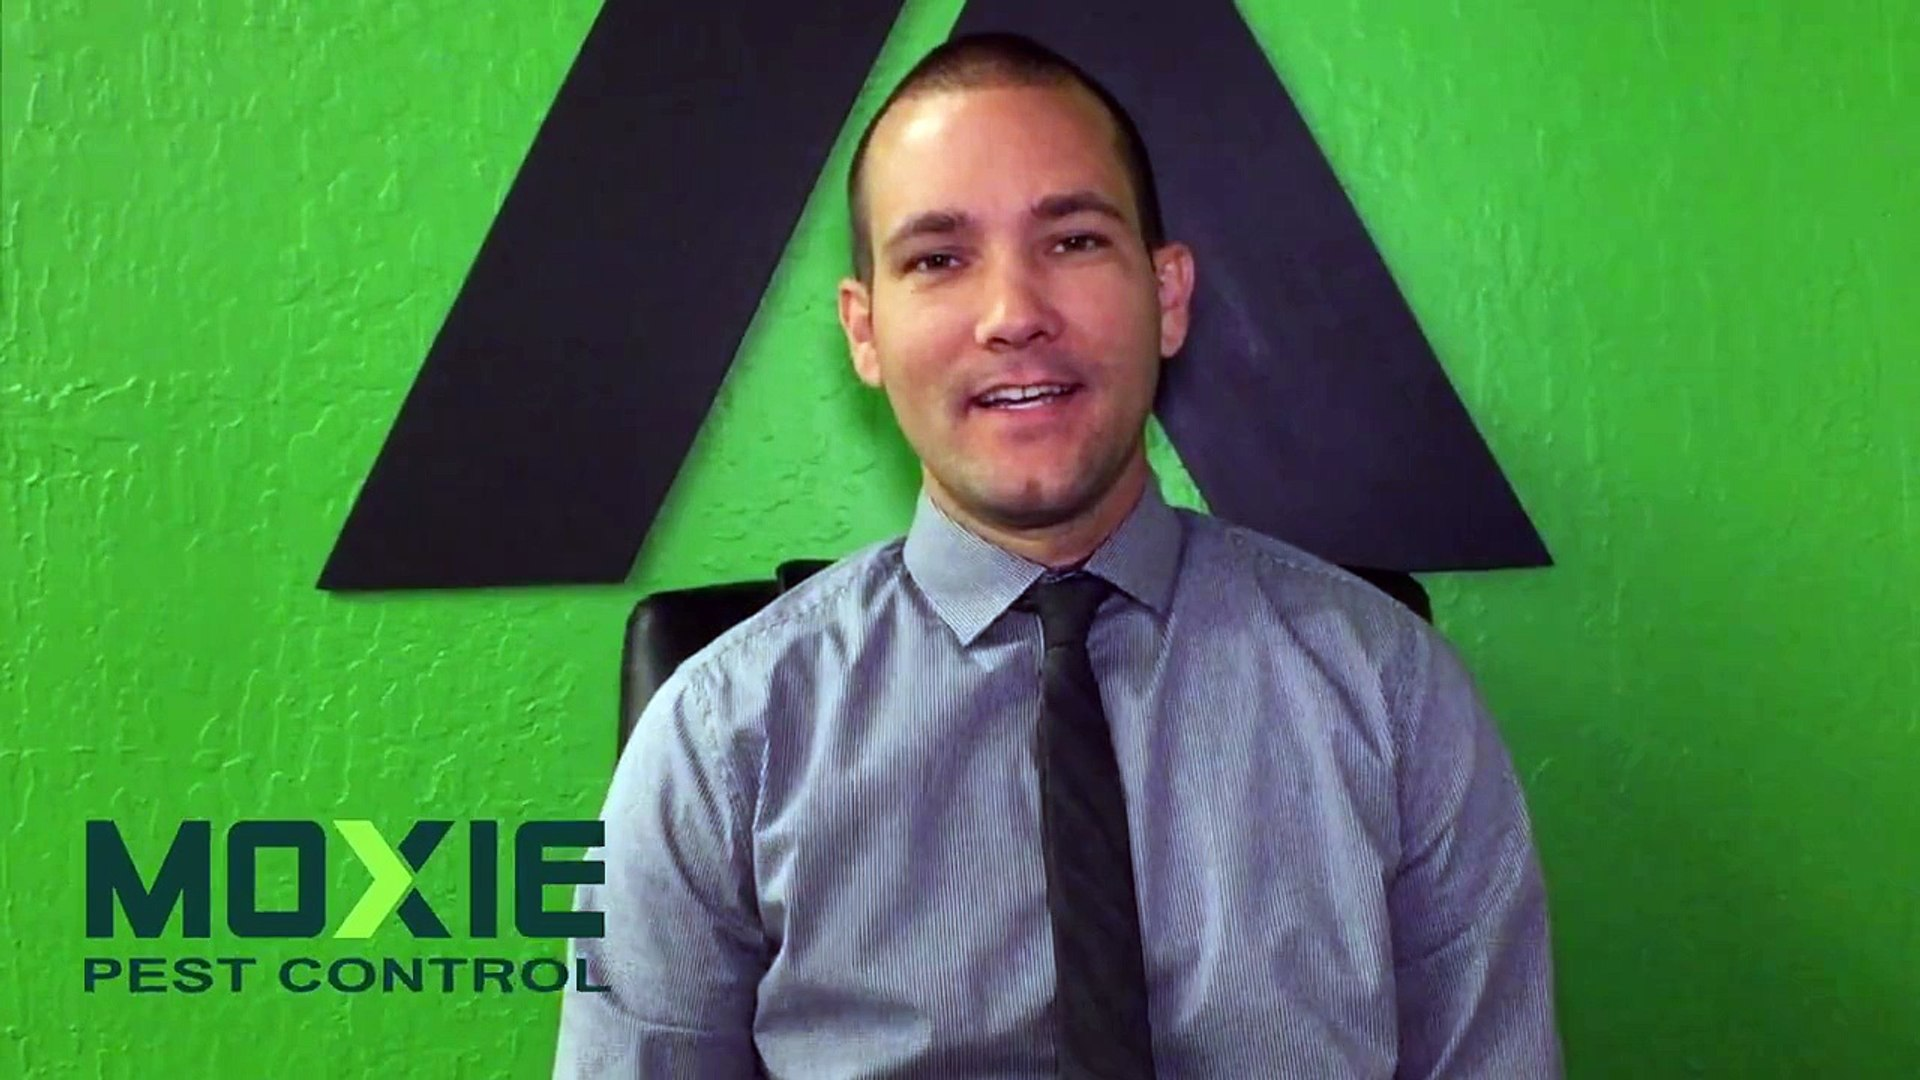 Moxie Pest Control Phoenix Exterminator Video Dailymotion